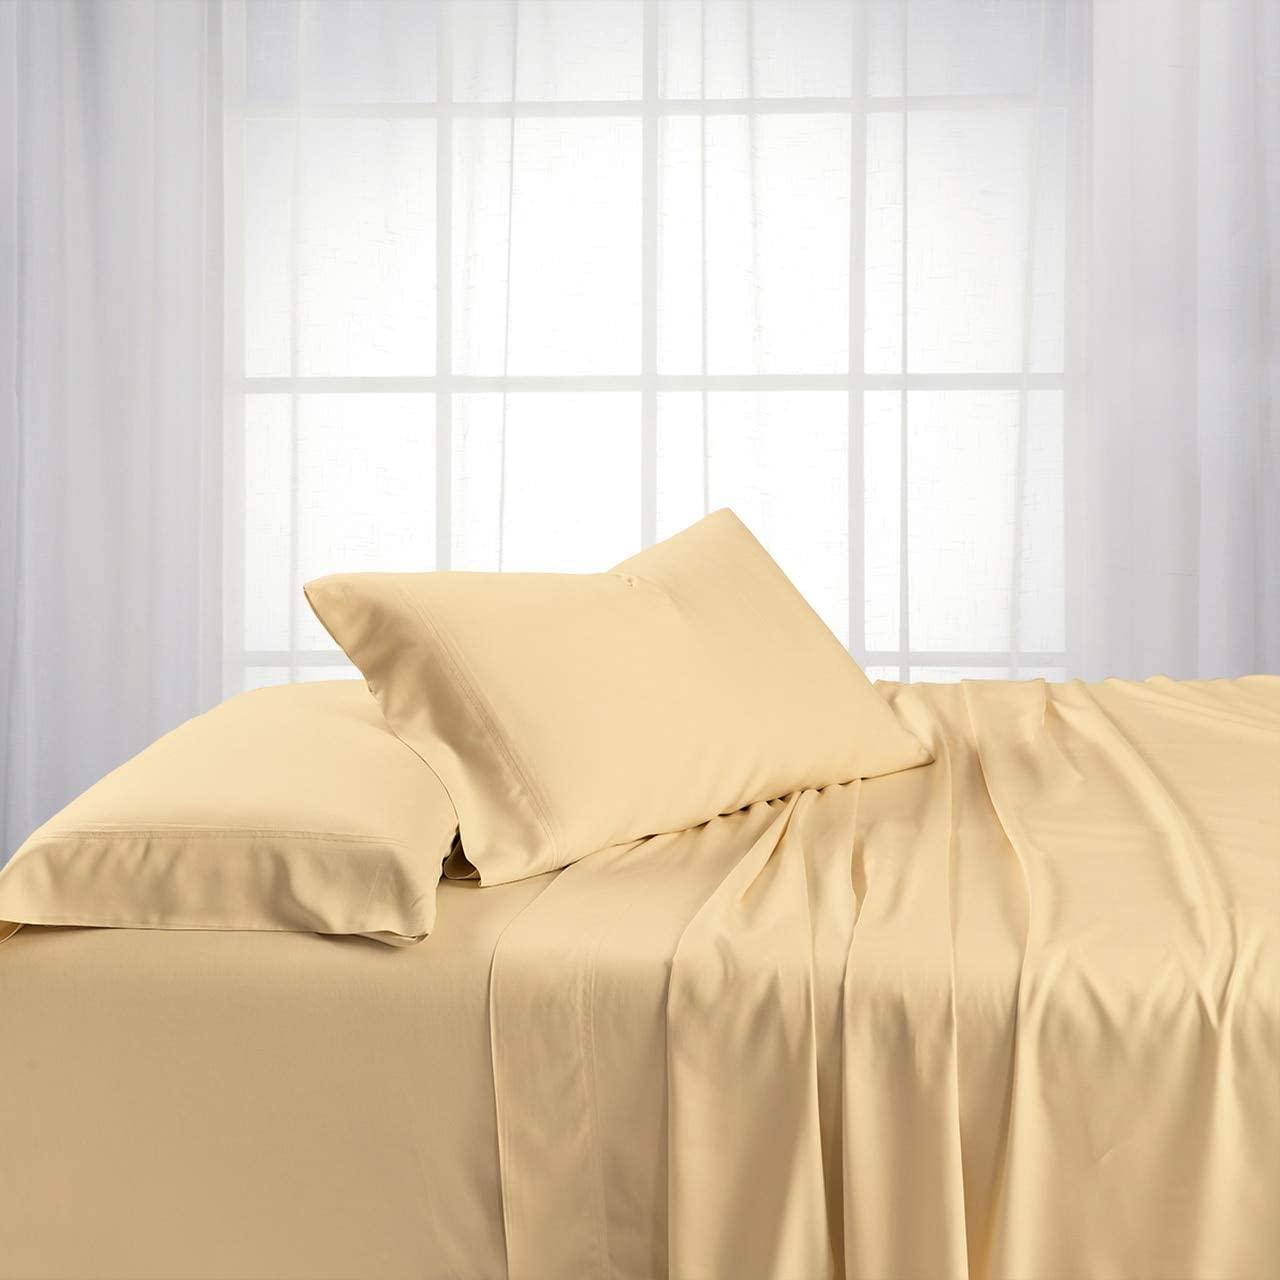 Royal Hotel ABRIPEDIC Bamboo Sheets, 600 Thread Count, Silky Soft Sheets 100% Viscose from Bamboo Sheet Set, Top-Split-King : Adjustable Split Top King, Canvas